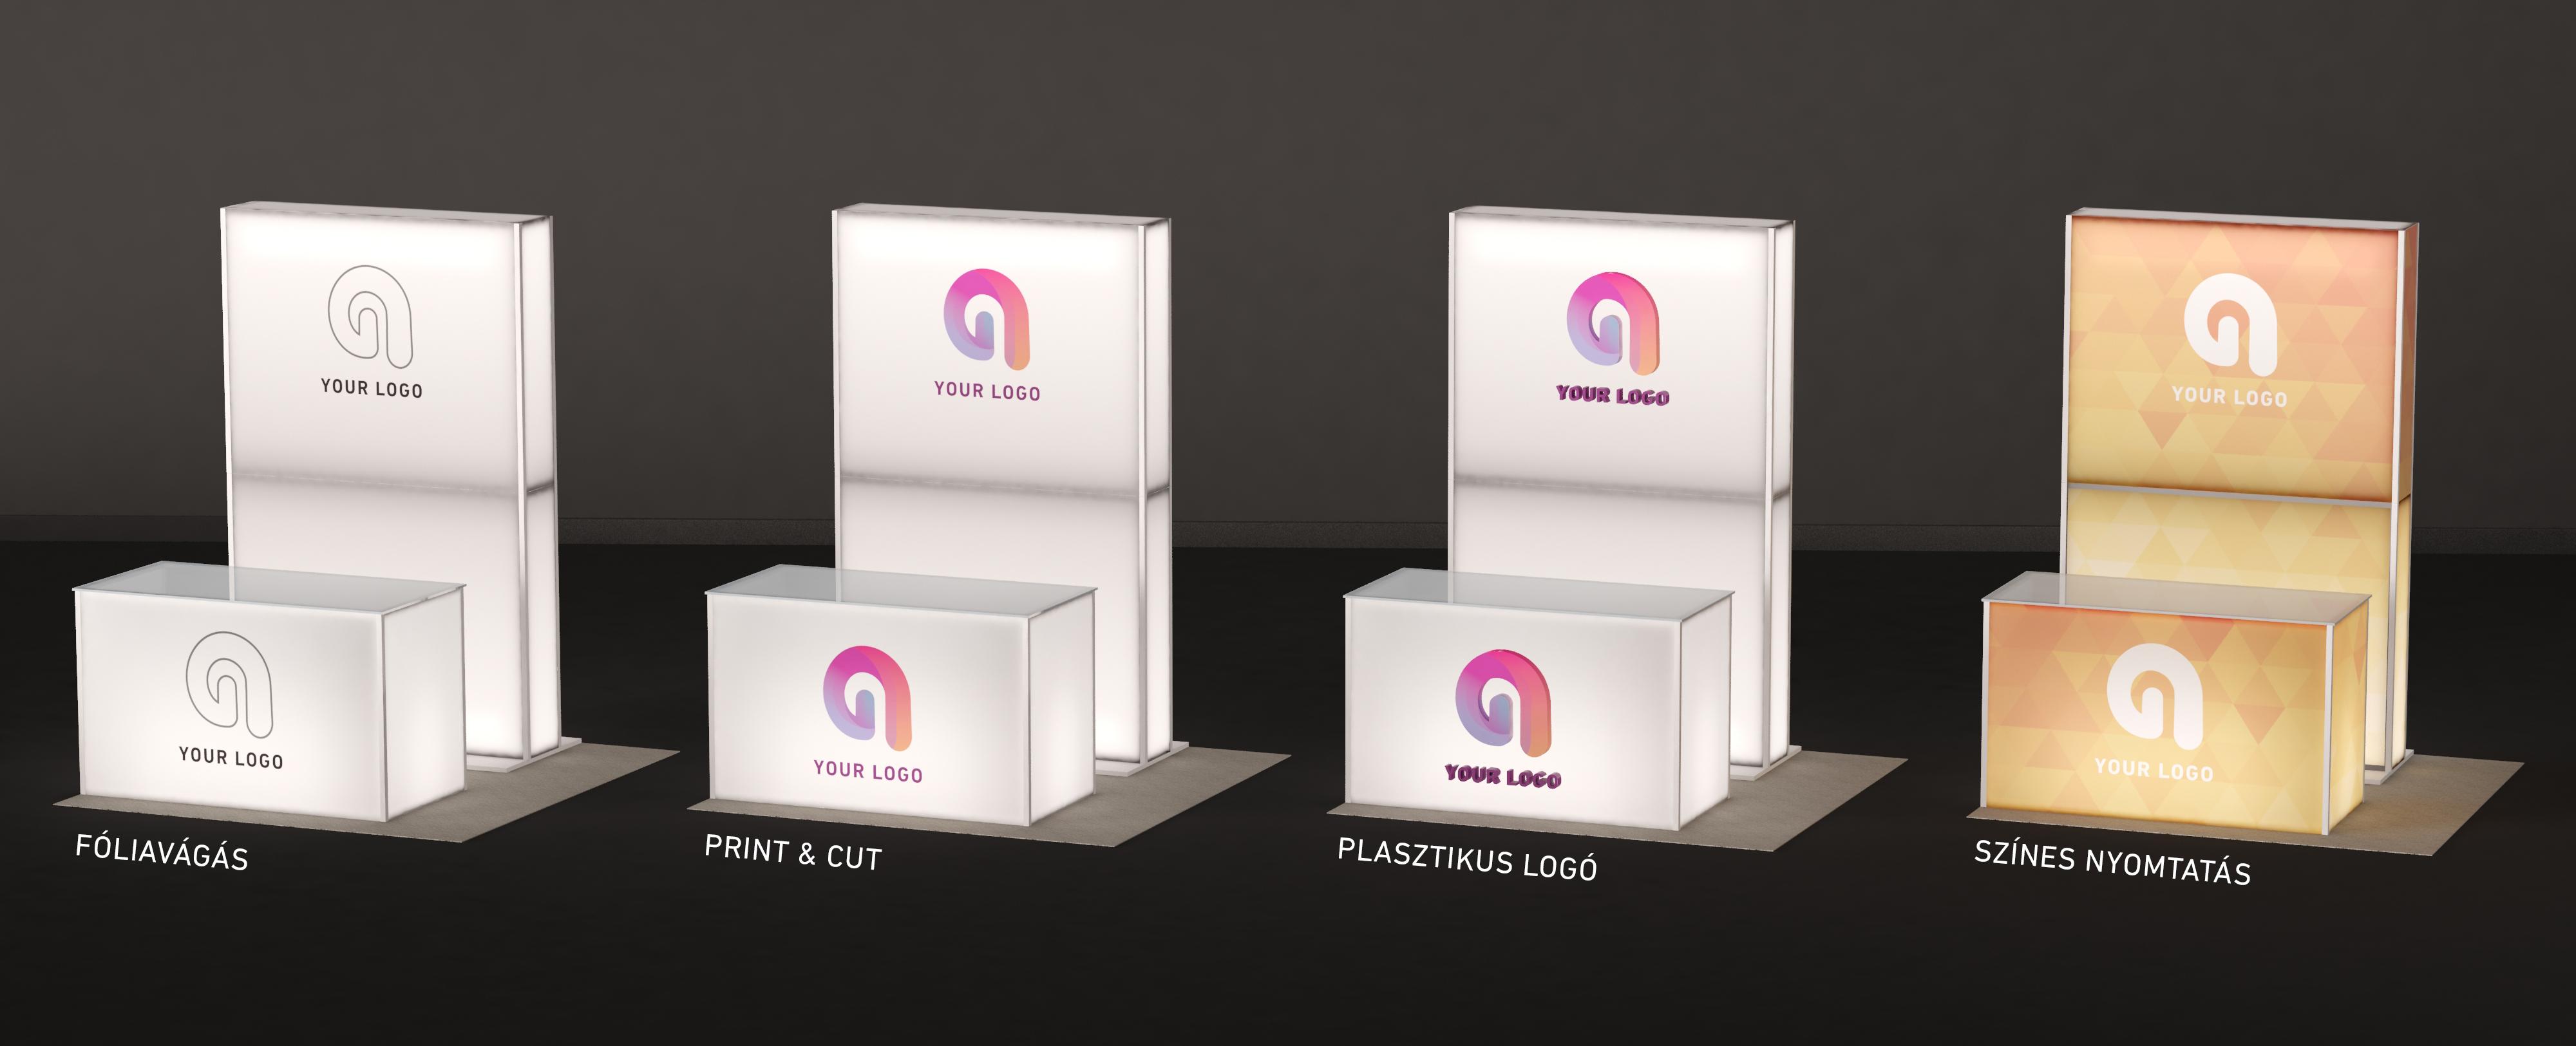 stand_branding_1 copy